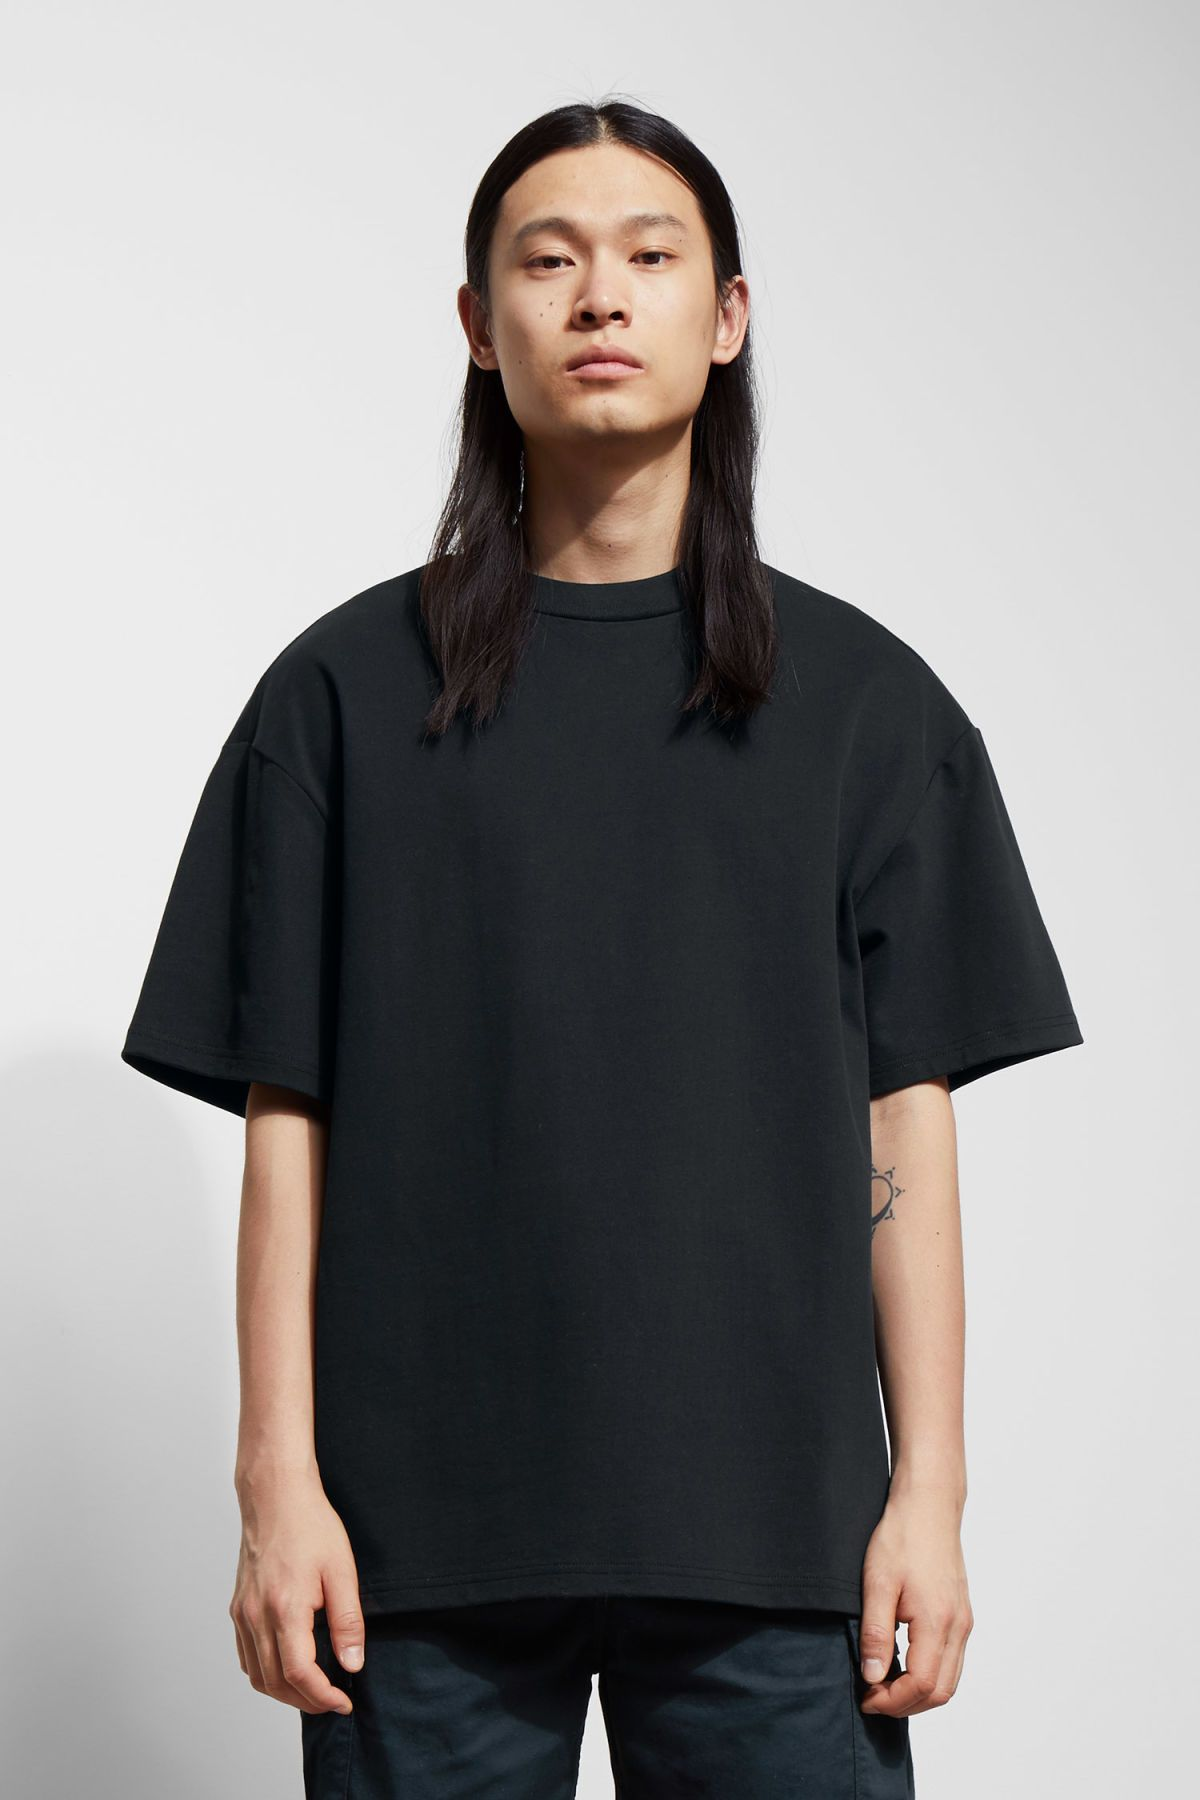 7560d5ac Great T-shirt - White - Tops | High Fashion | Great t shirts, Shirts ...